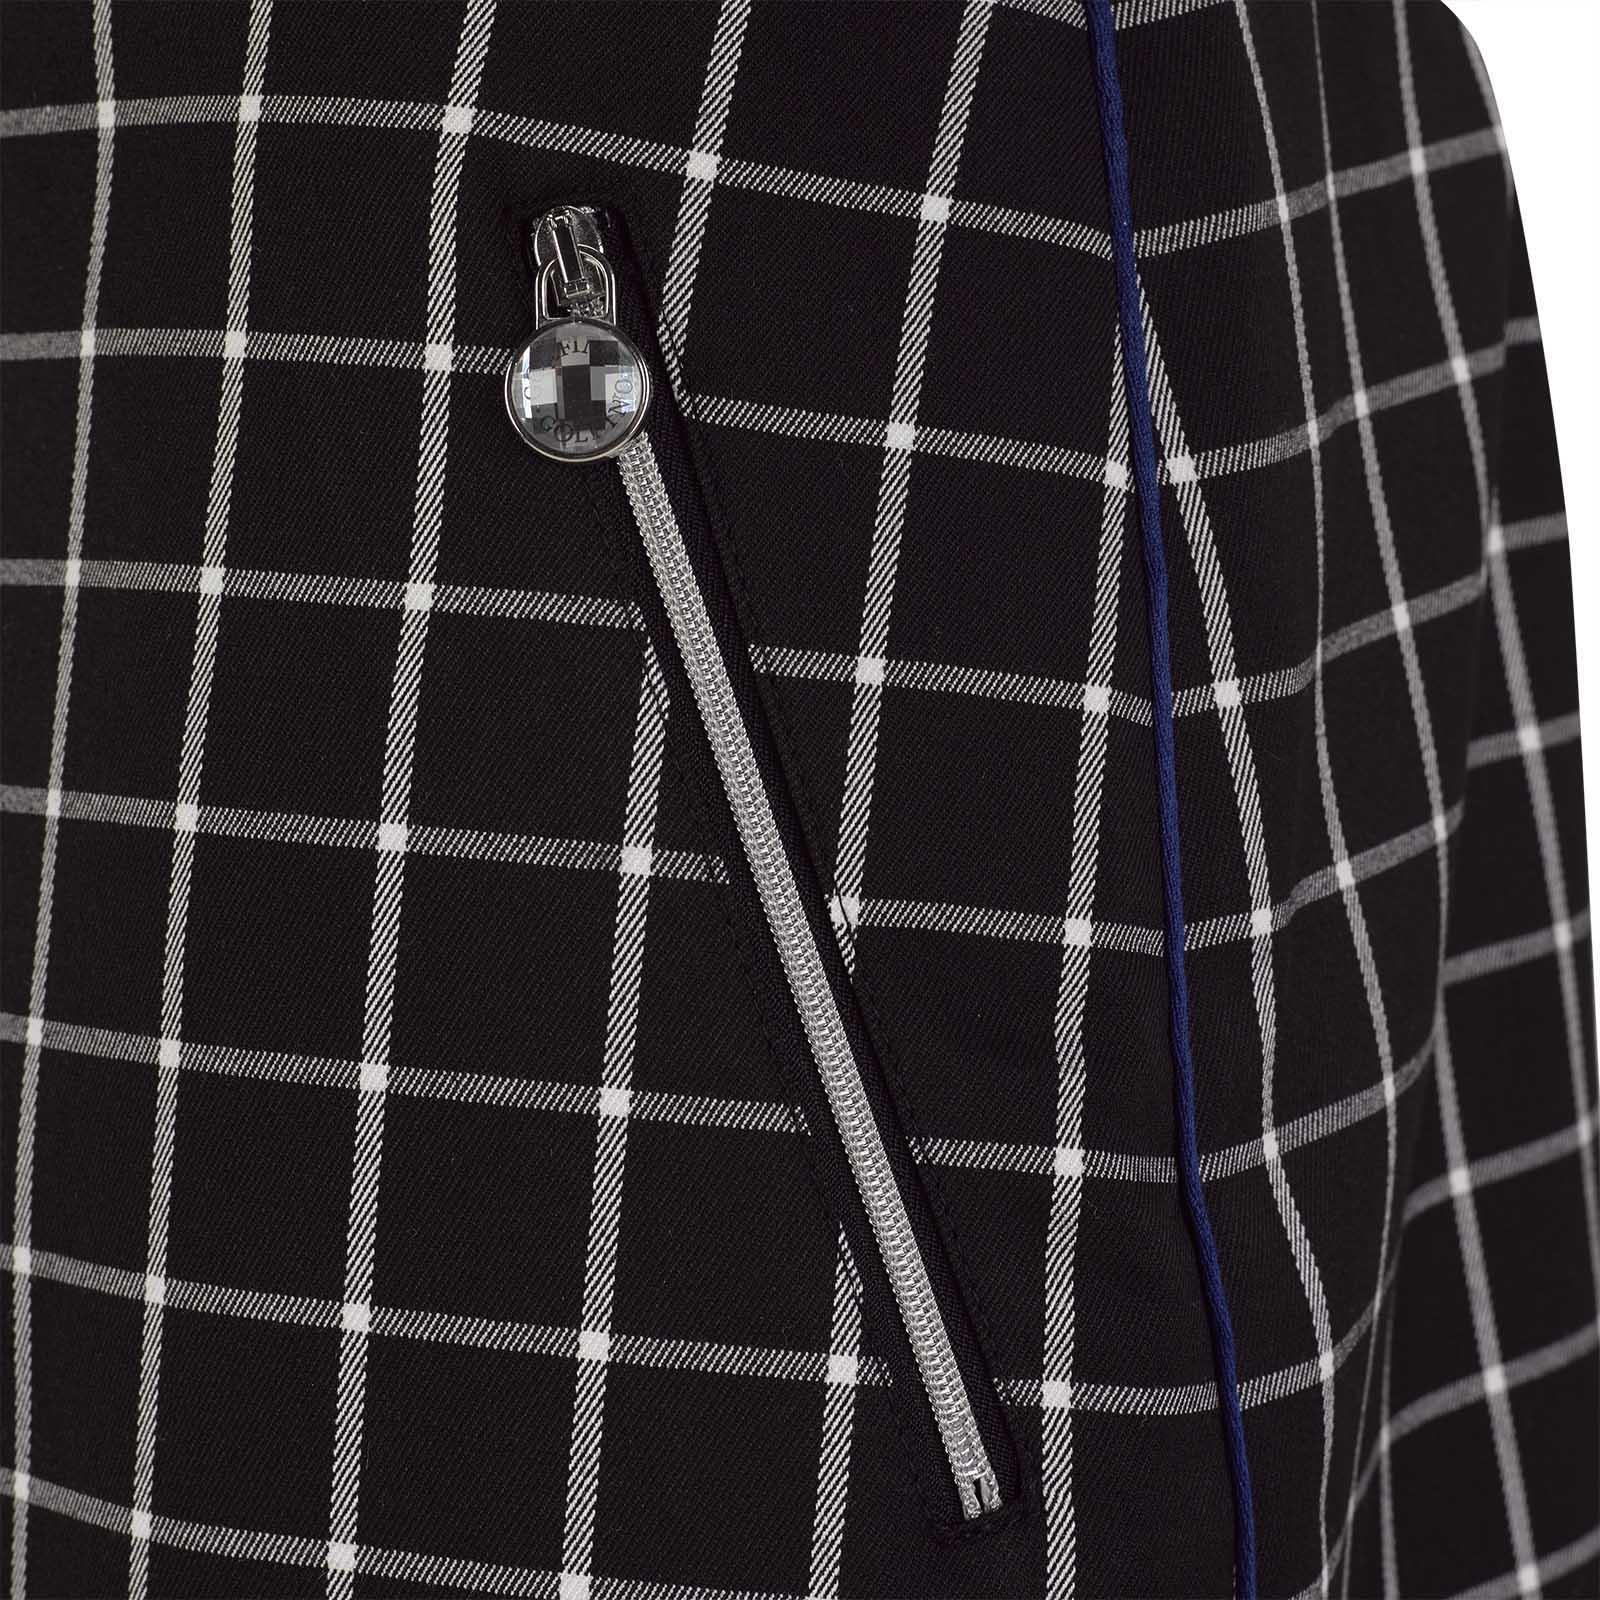 Damen Medium Karo-Golfrock aus Quick Dry Funktionsmaterial